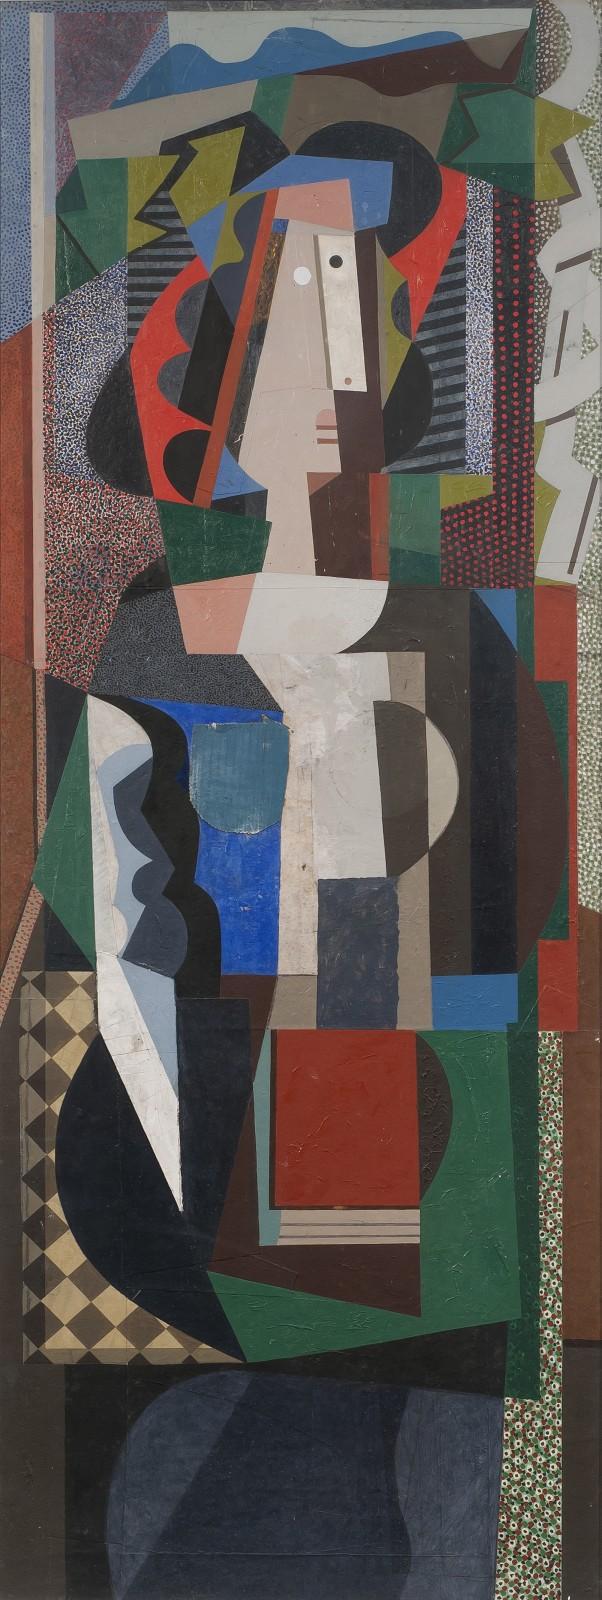 Bryan Ingham  Aysel Ozakin, Rue de Seine, 1991  Oil on board  137 x 51 cm